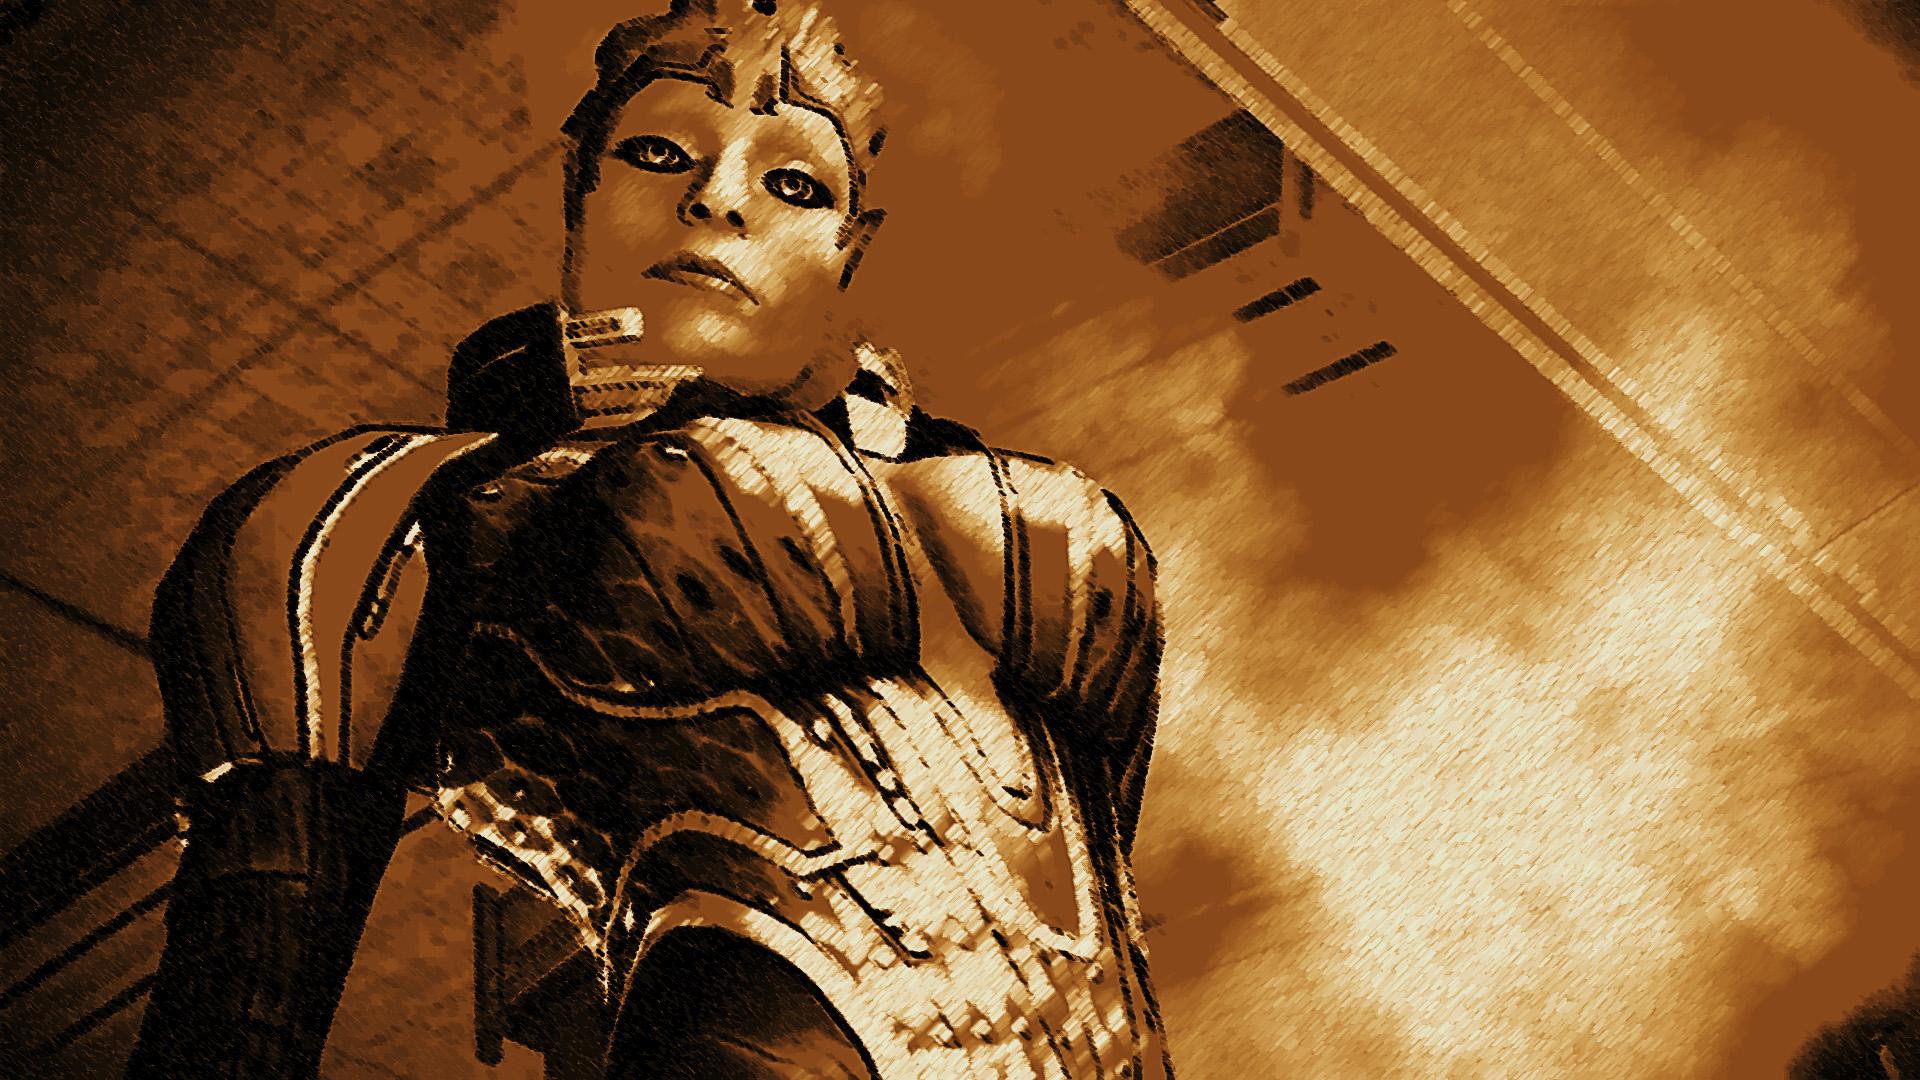 Mass Effect 3: Samara 1 by Lootra